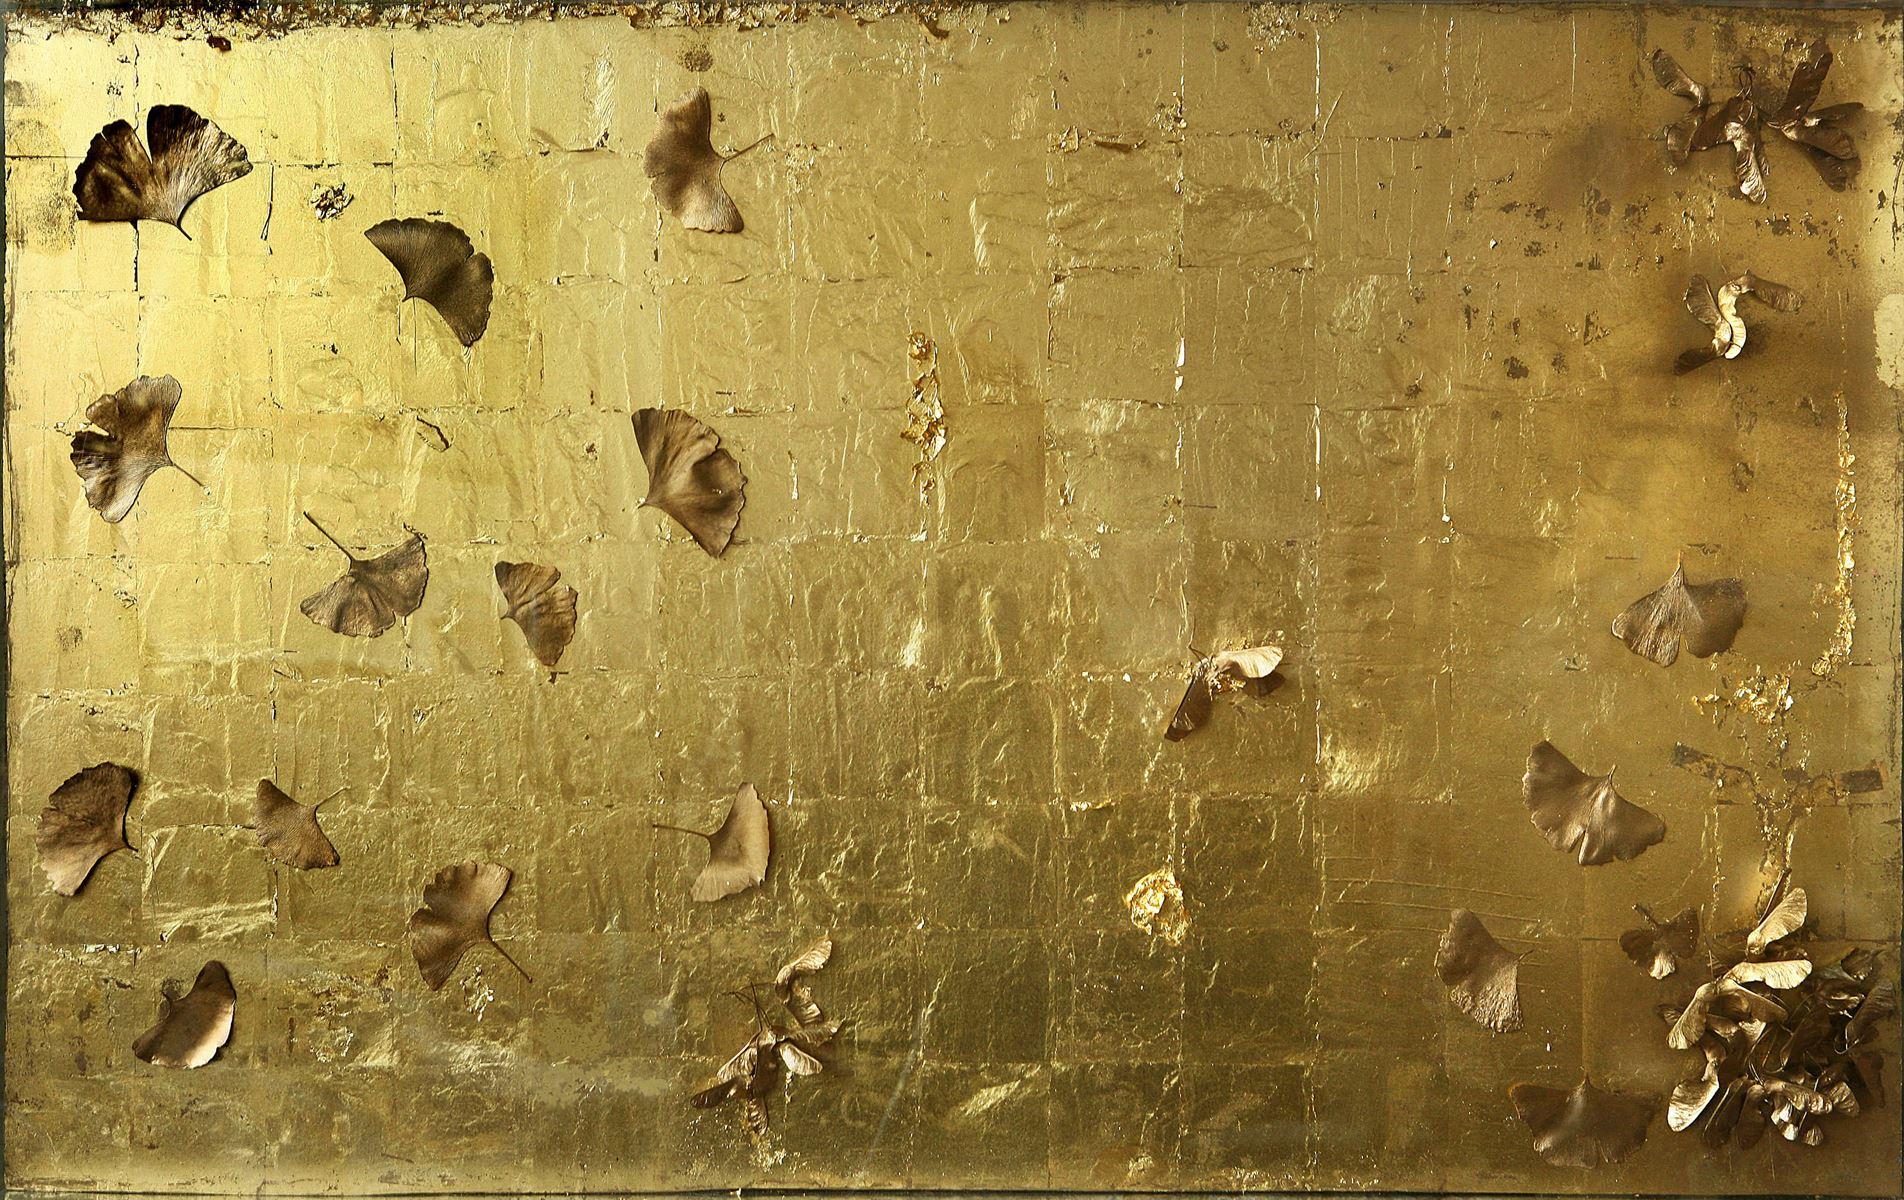 Tana. Technique mixte sur carton. 70 x 112 cm